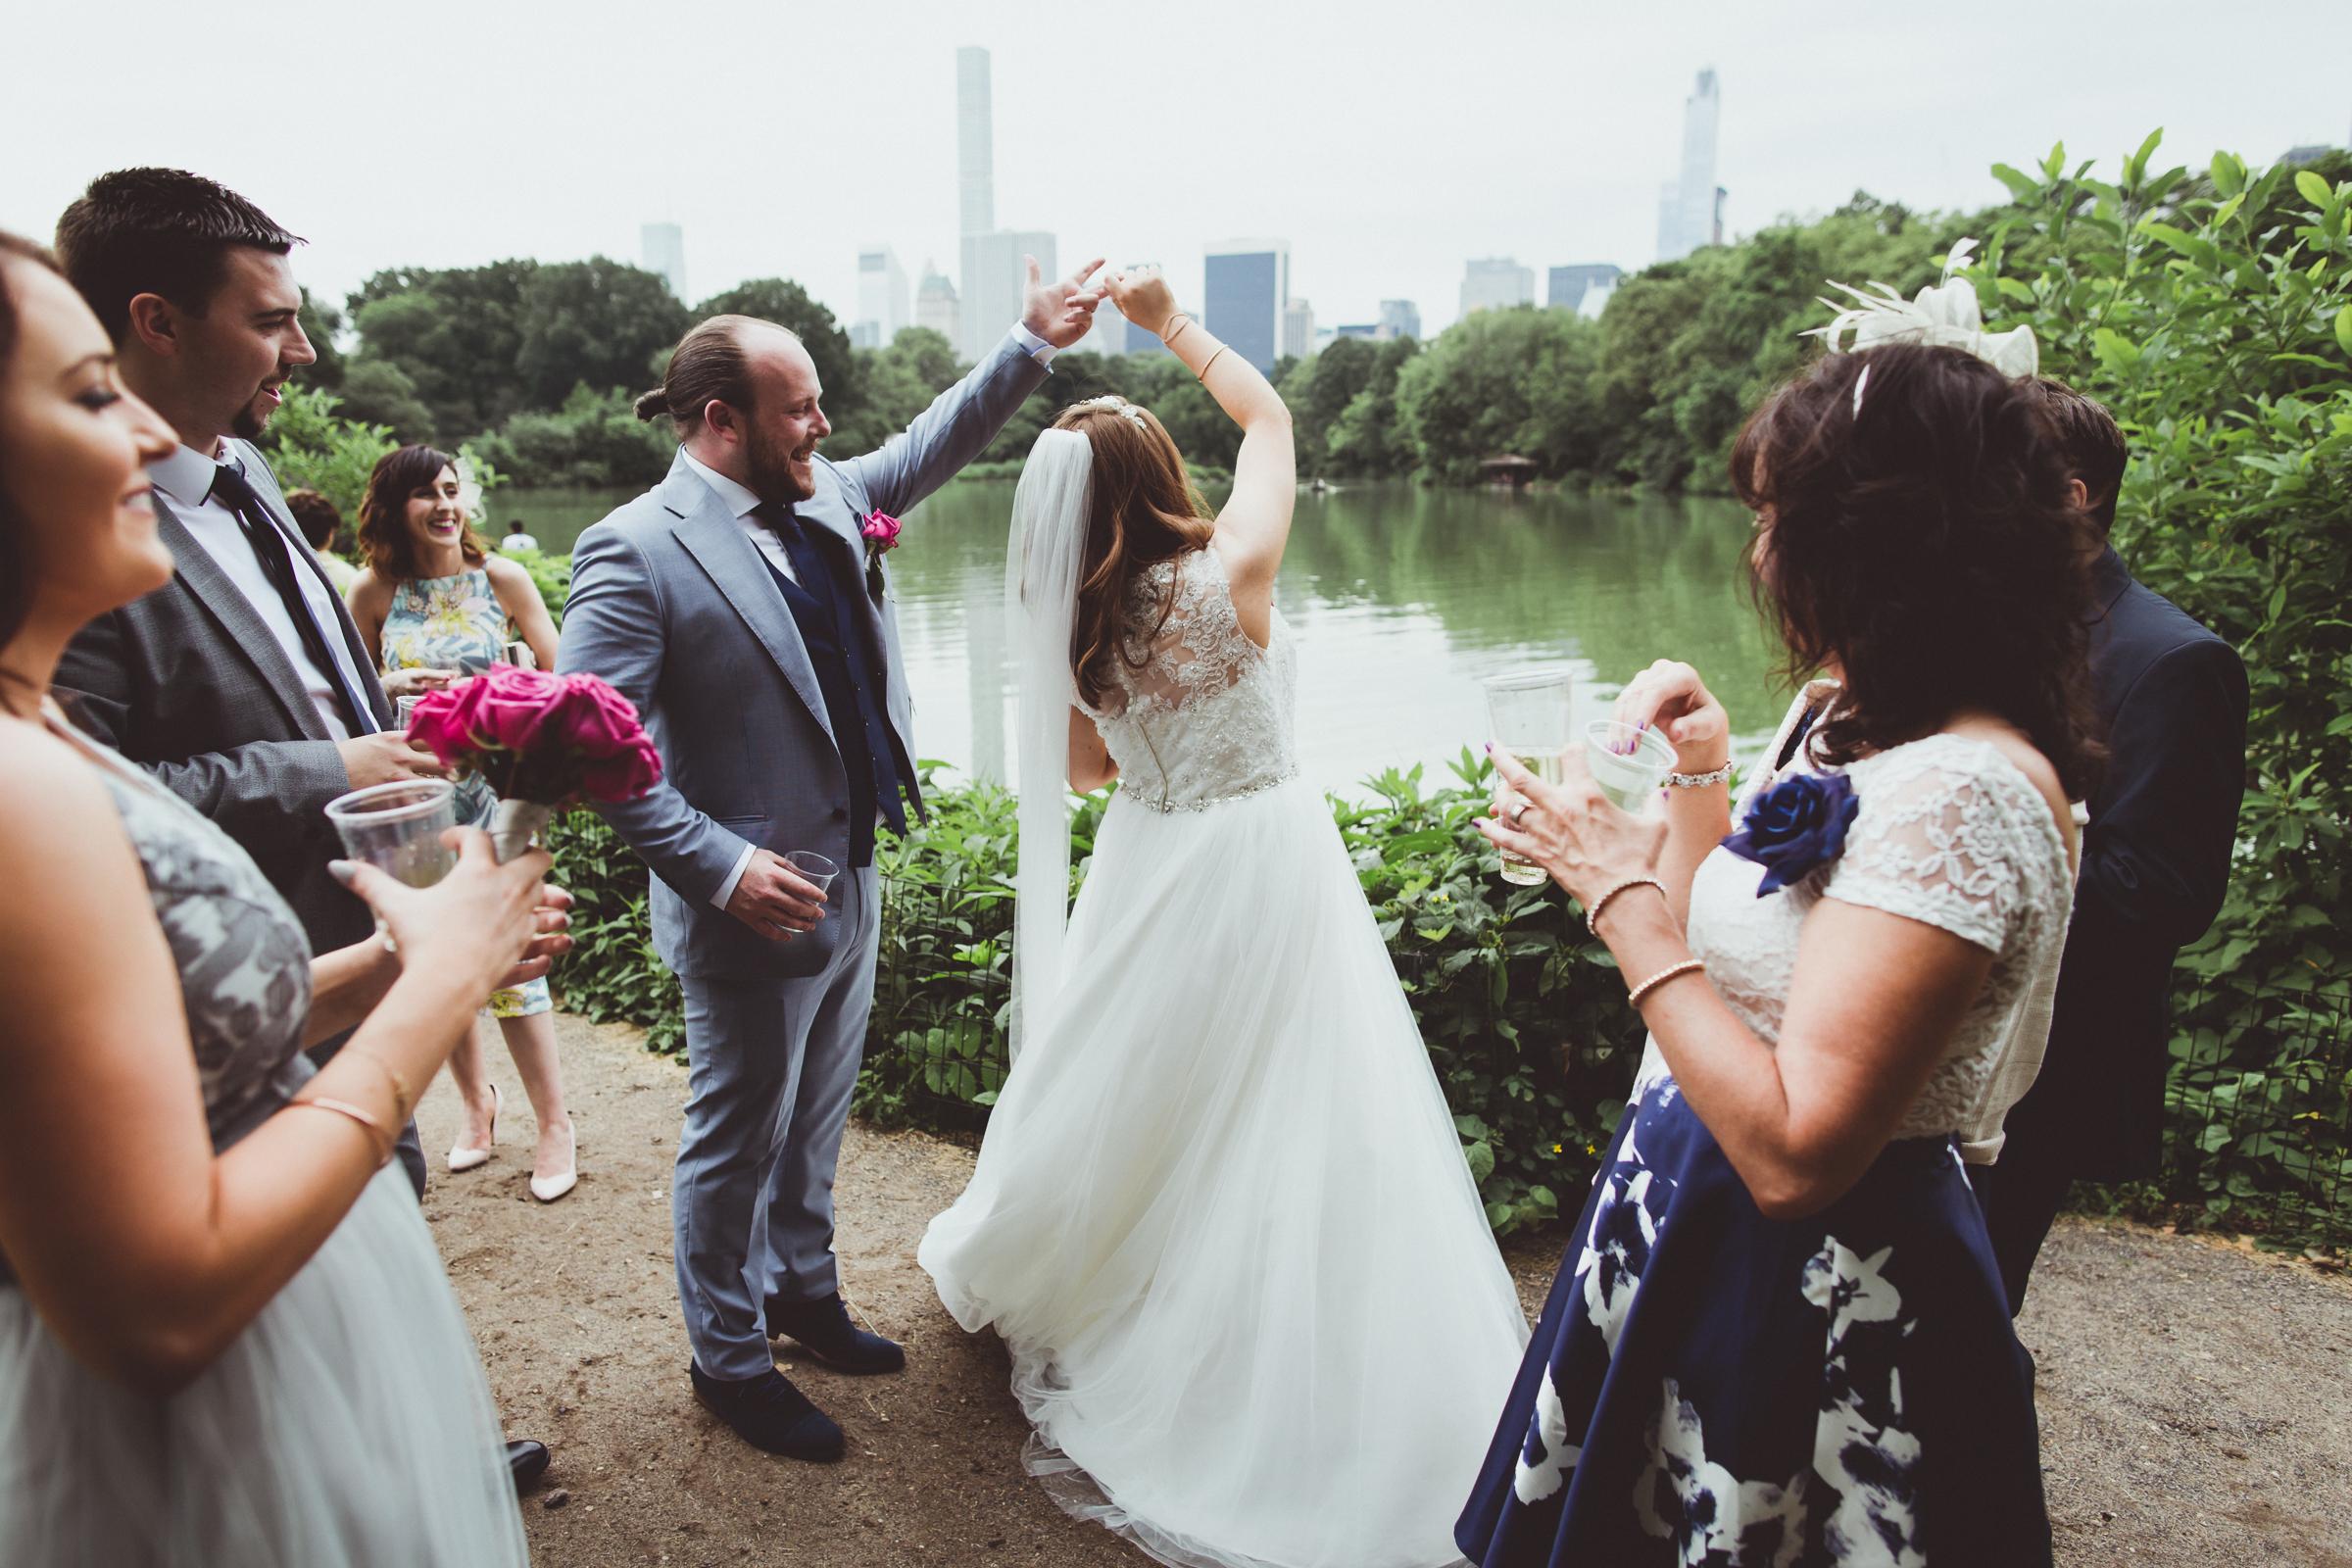 NYC-Central-Park-Elopement-New-York-Documentary-Wedding-Photographer-Dumbo-Brooklyn-Bridge-Park--29.jpg